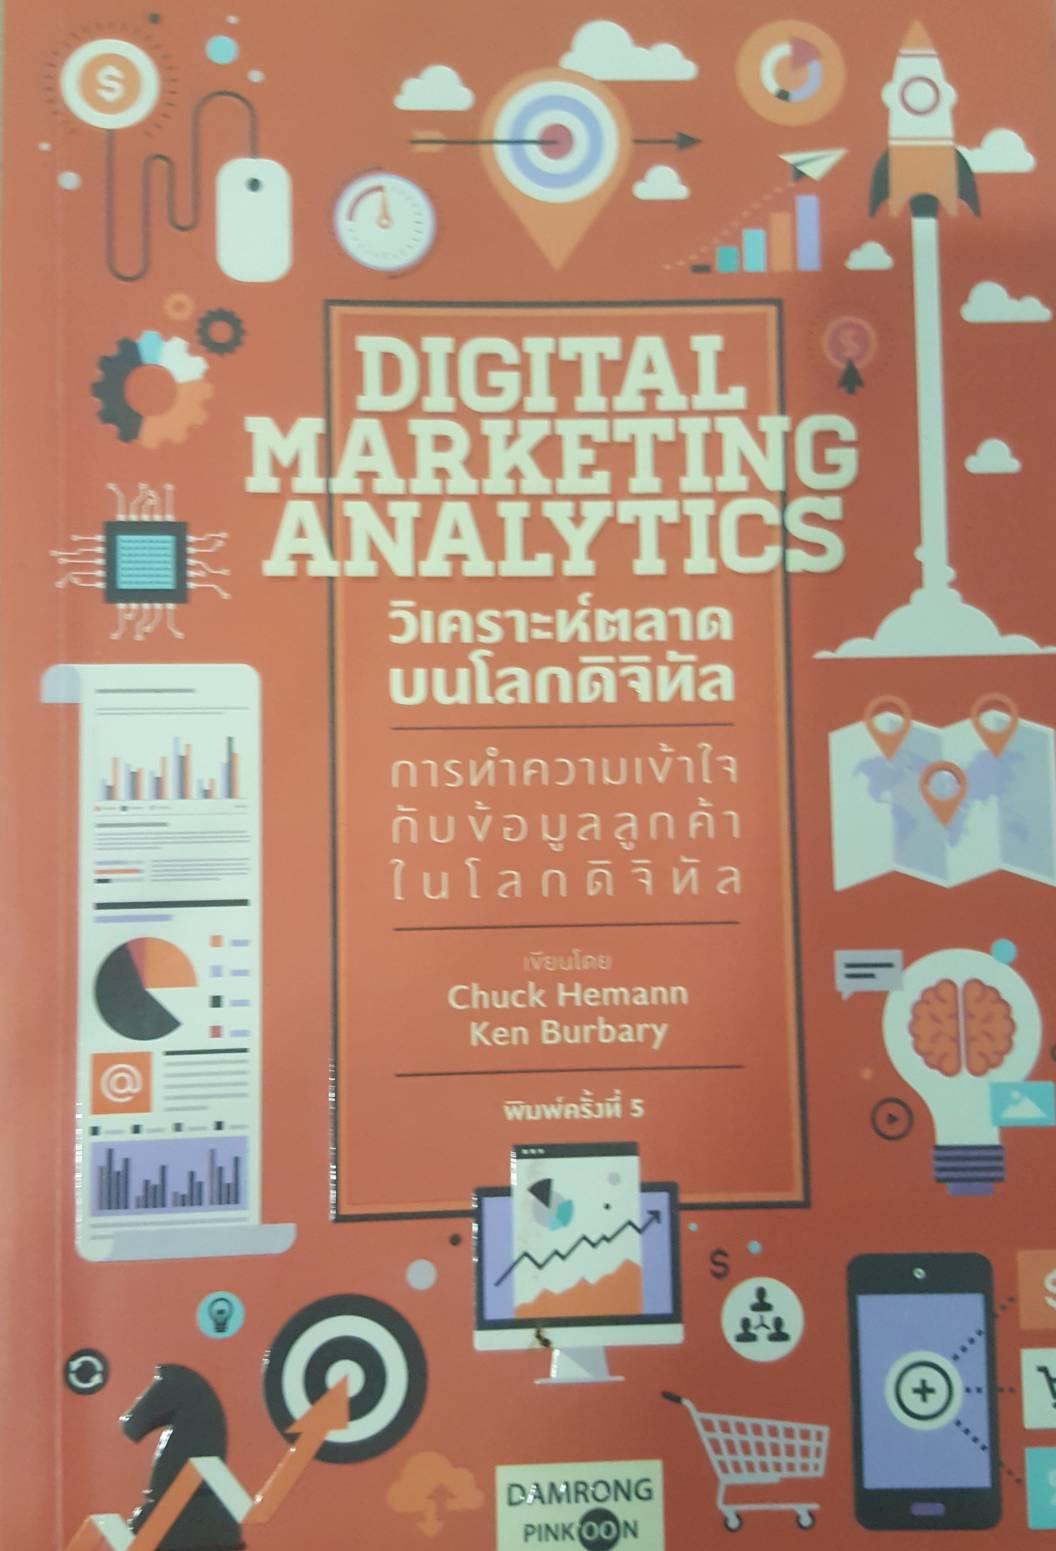 Digital Marketing Analytics วิเคราะห์ตลาดบนโลกดิจิตัล